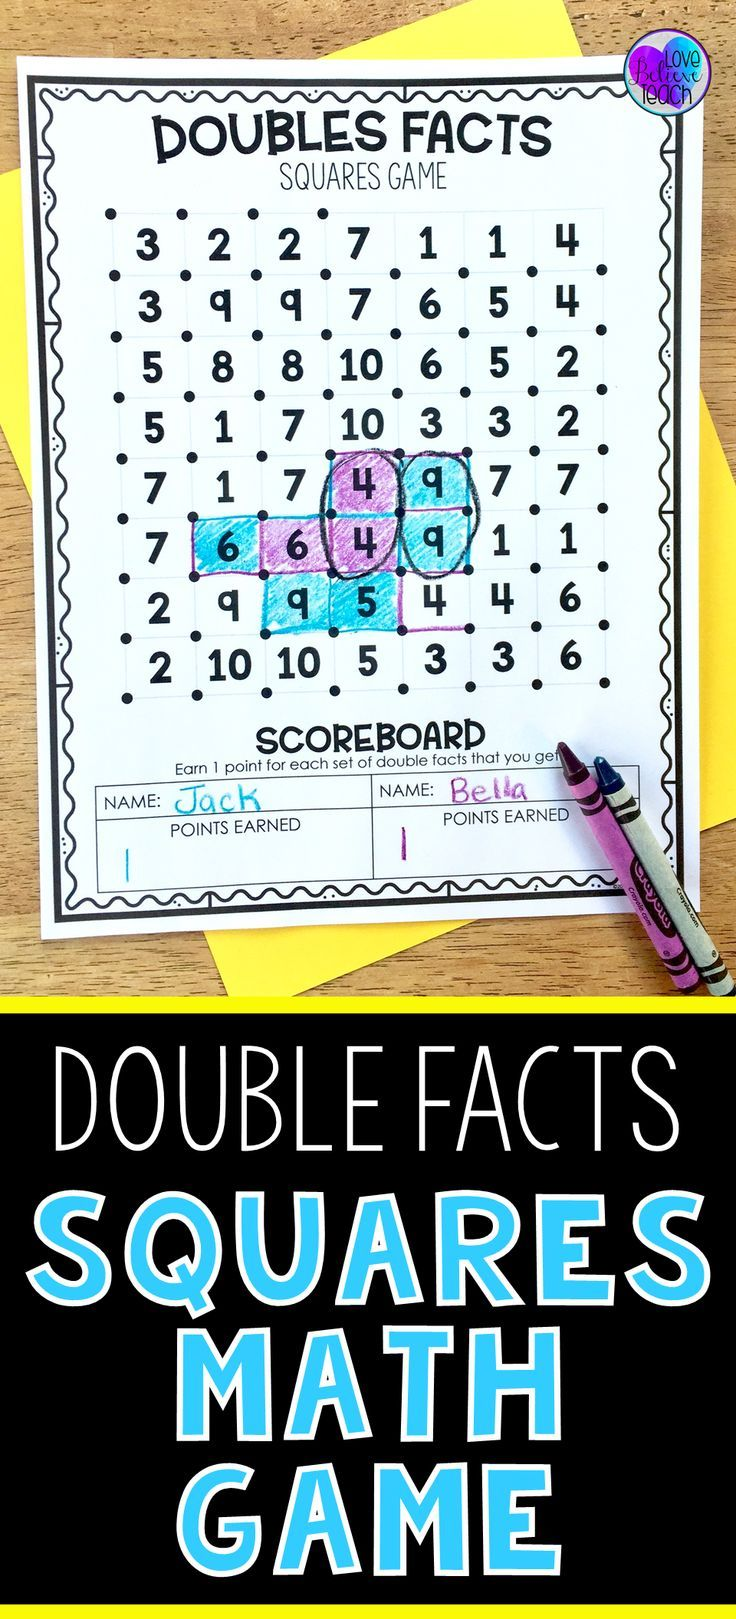 Double Facts Squares Math Game | Teacher - Math | Pinterest ...